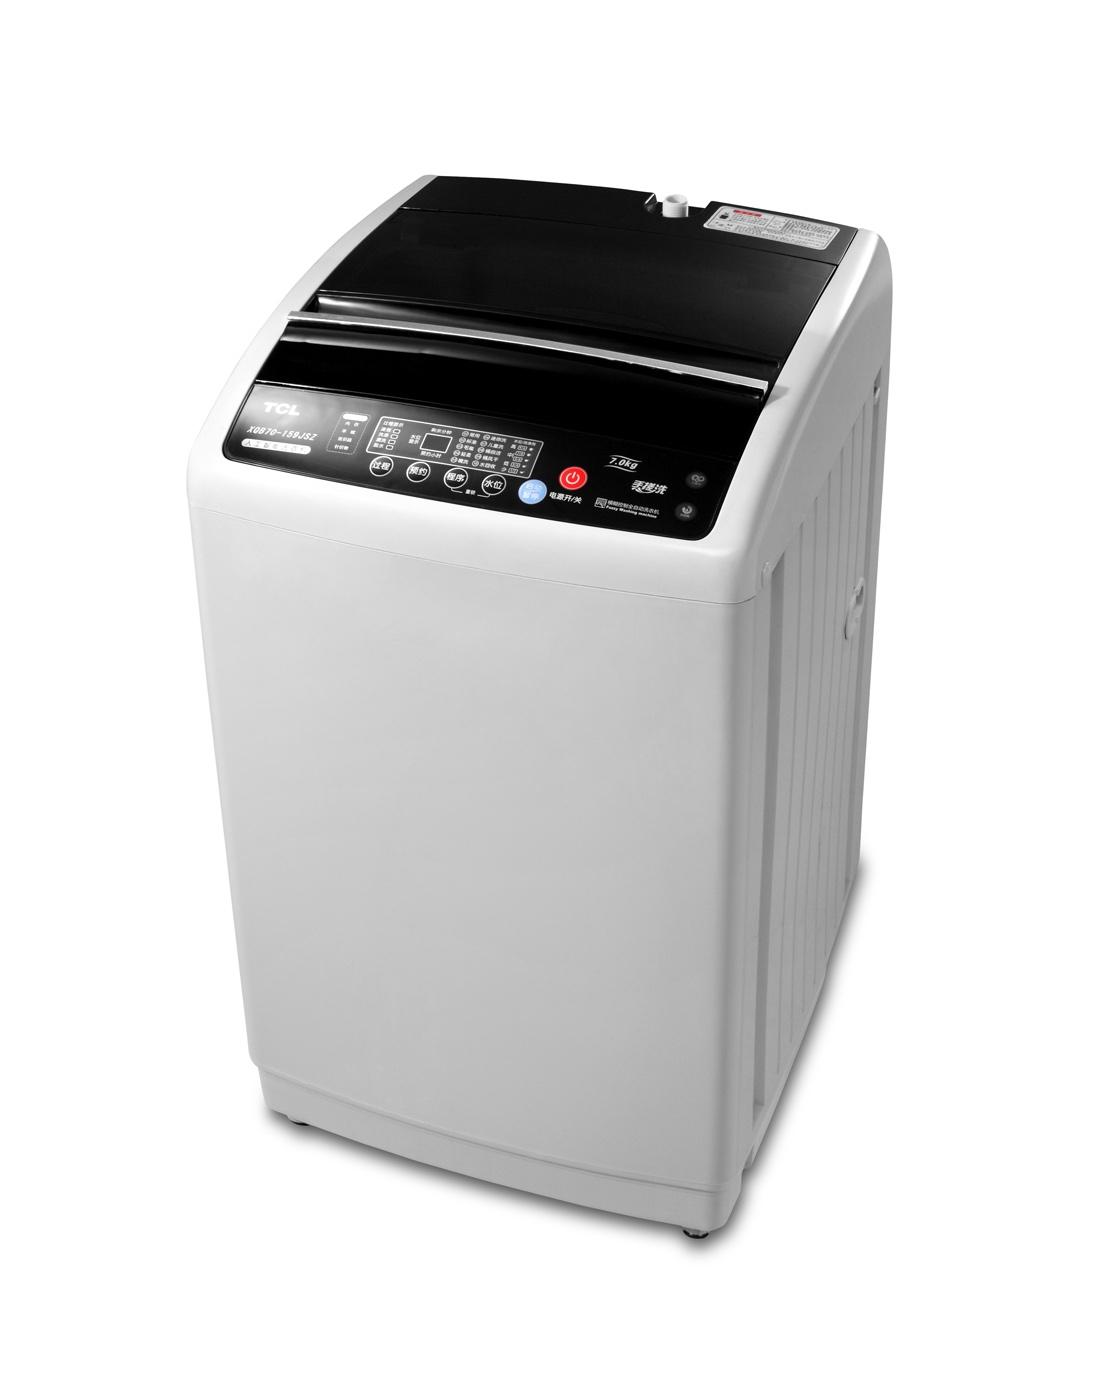 tcl冰箱洗衣机7公斤全自动波轮洗衣机xqb70-159sz亮